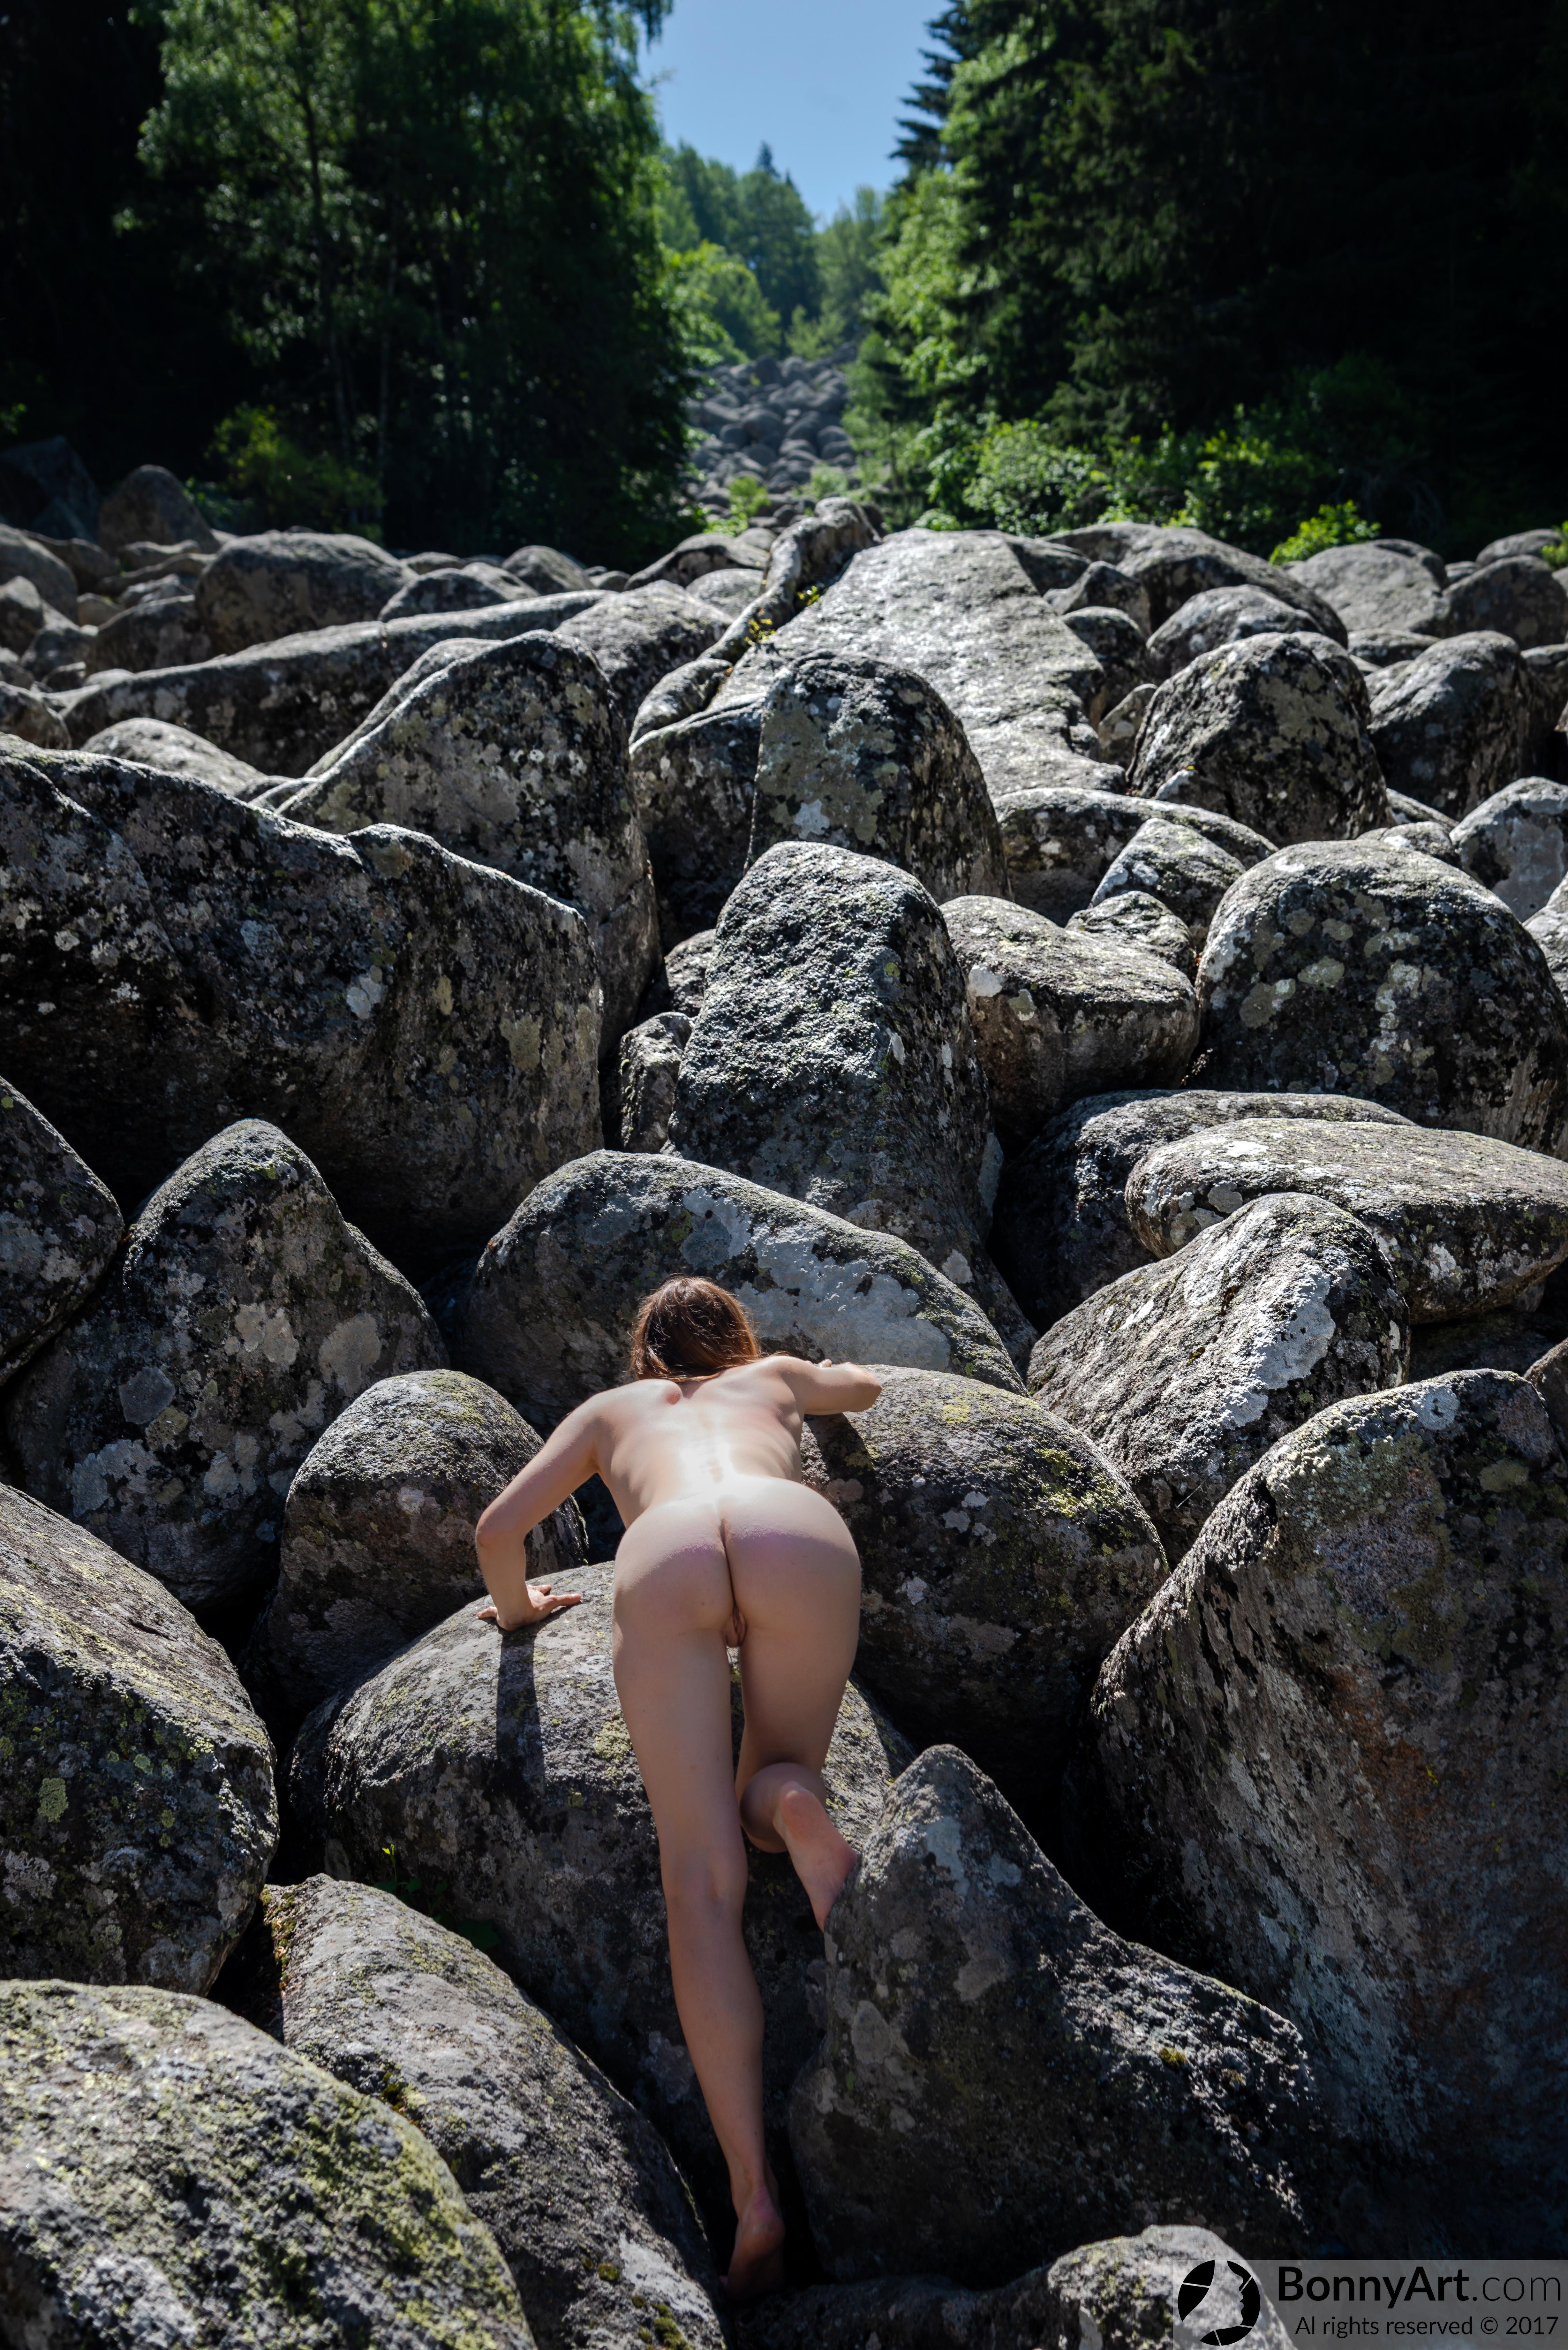 Free Naked Videos Of Girls